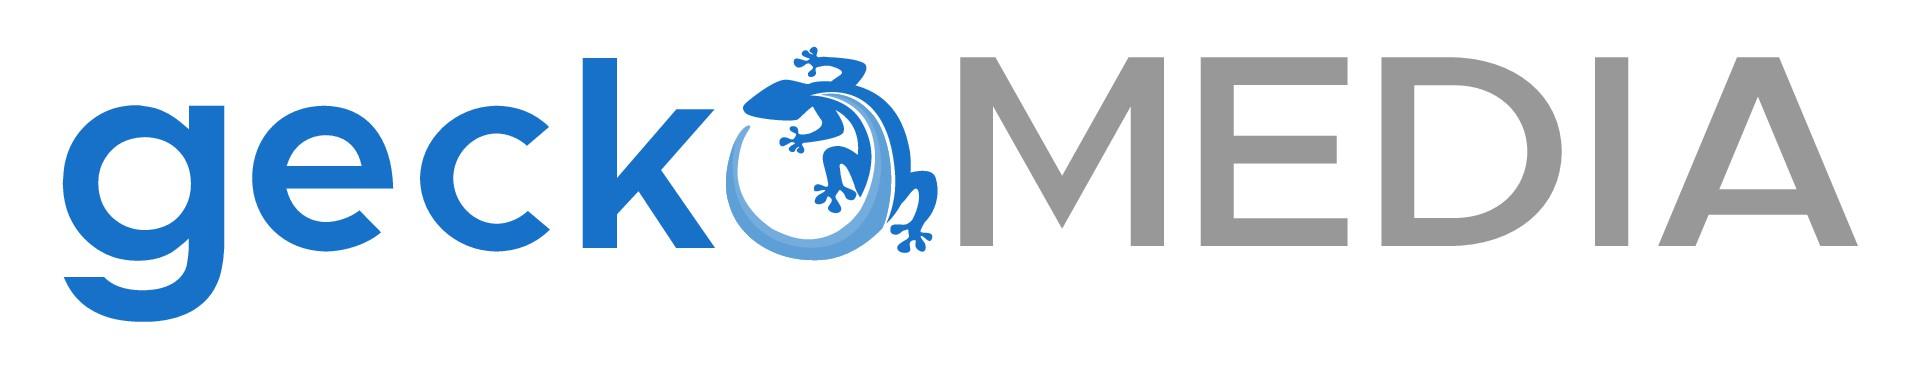 Gecko Media Corporate Logo